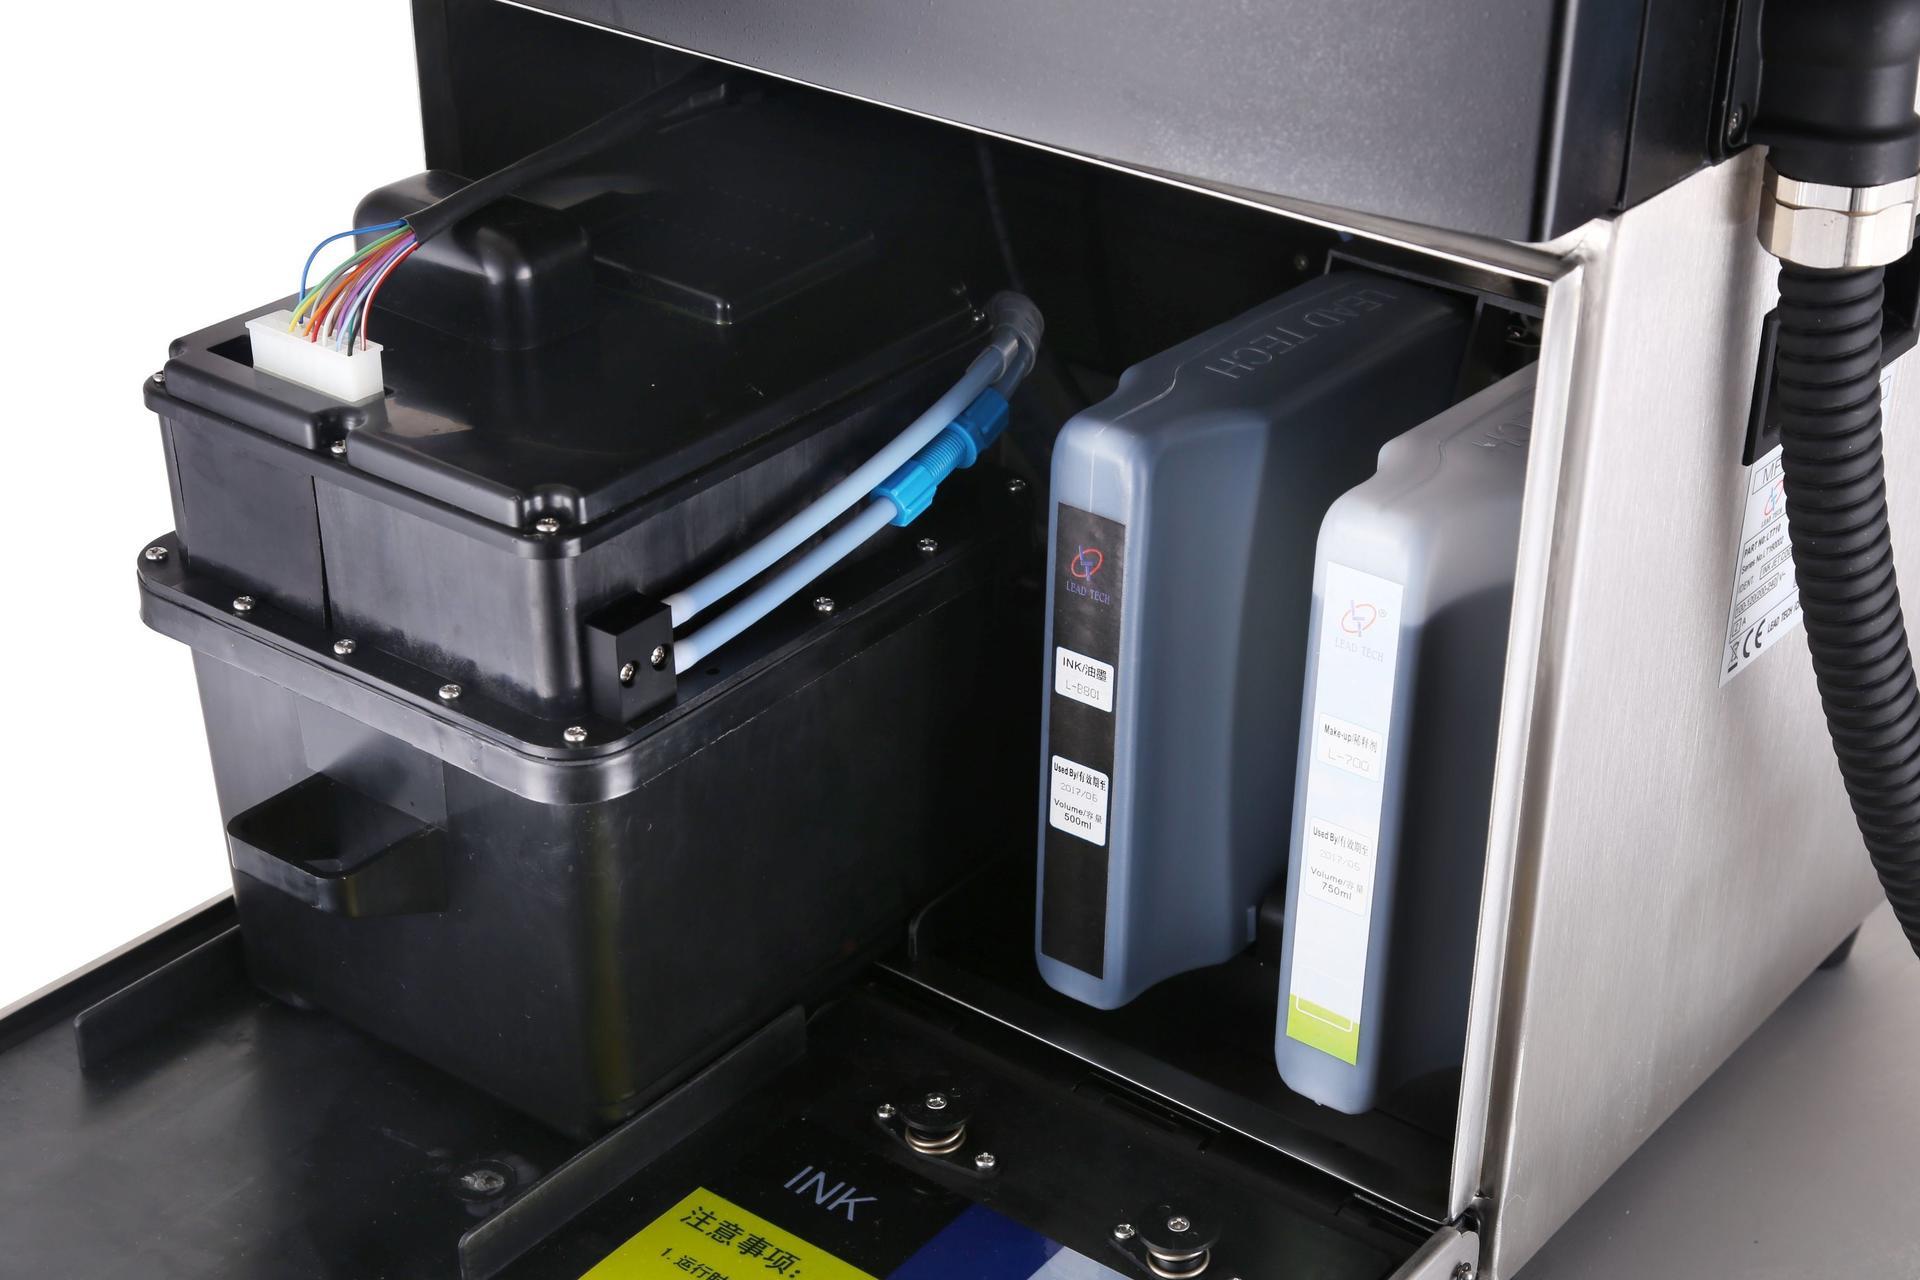 Lead Tech Lt760 Cij Inkjet Printer for PE Pipe Coding